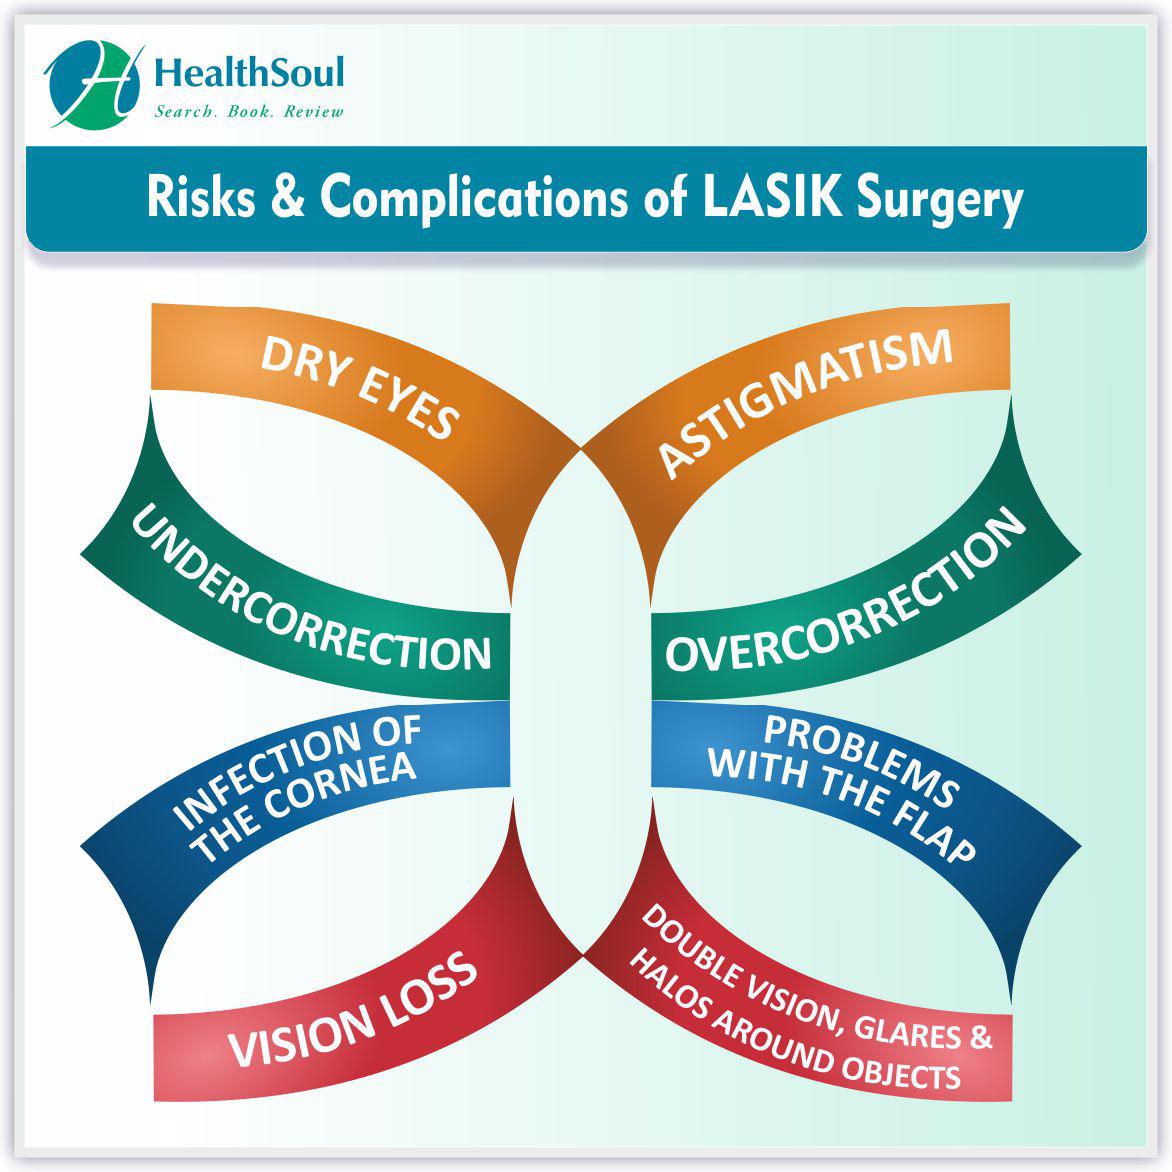 Risks & Complications of LASIK Surgery | HealthSoul